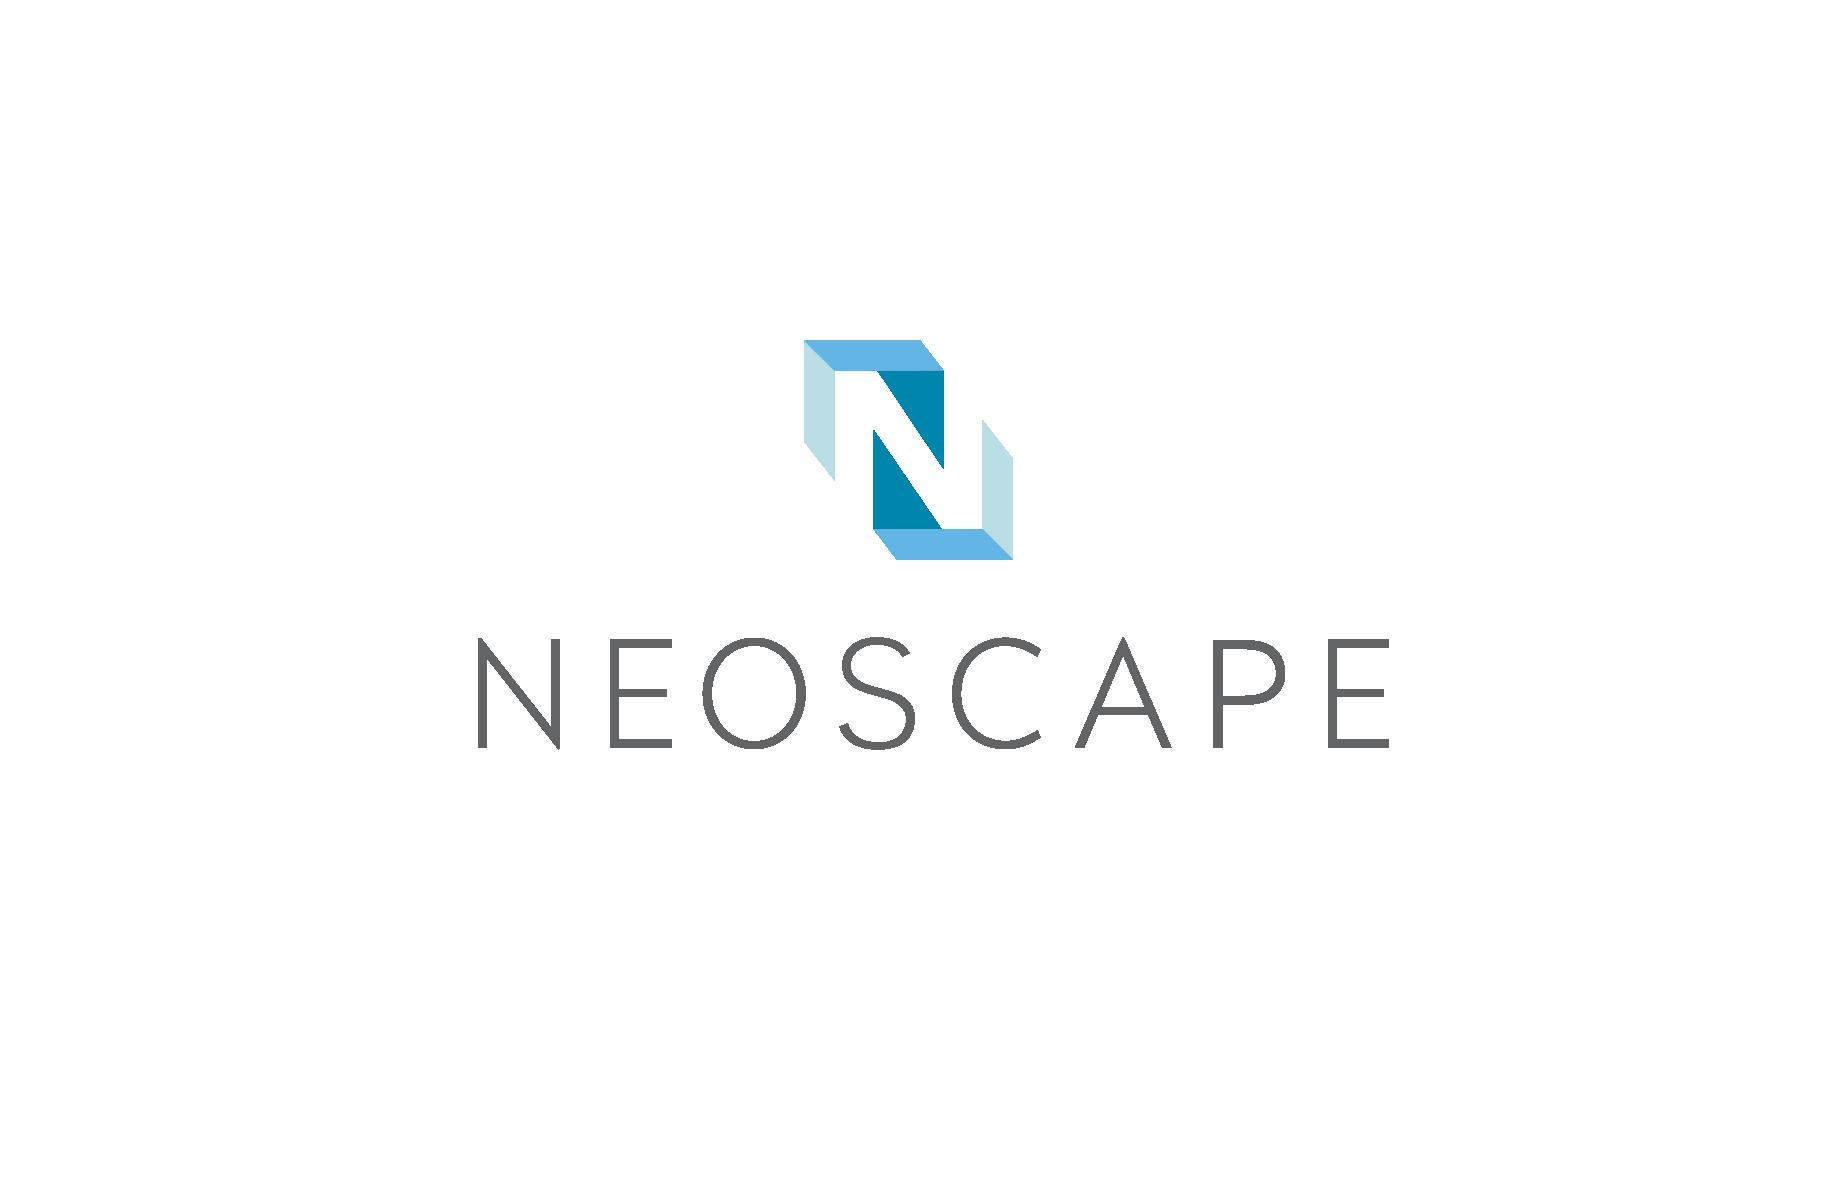 Neoscape2015_Logo_rgb_white_bg.png